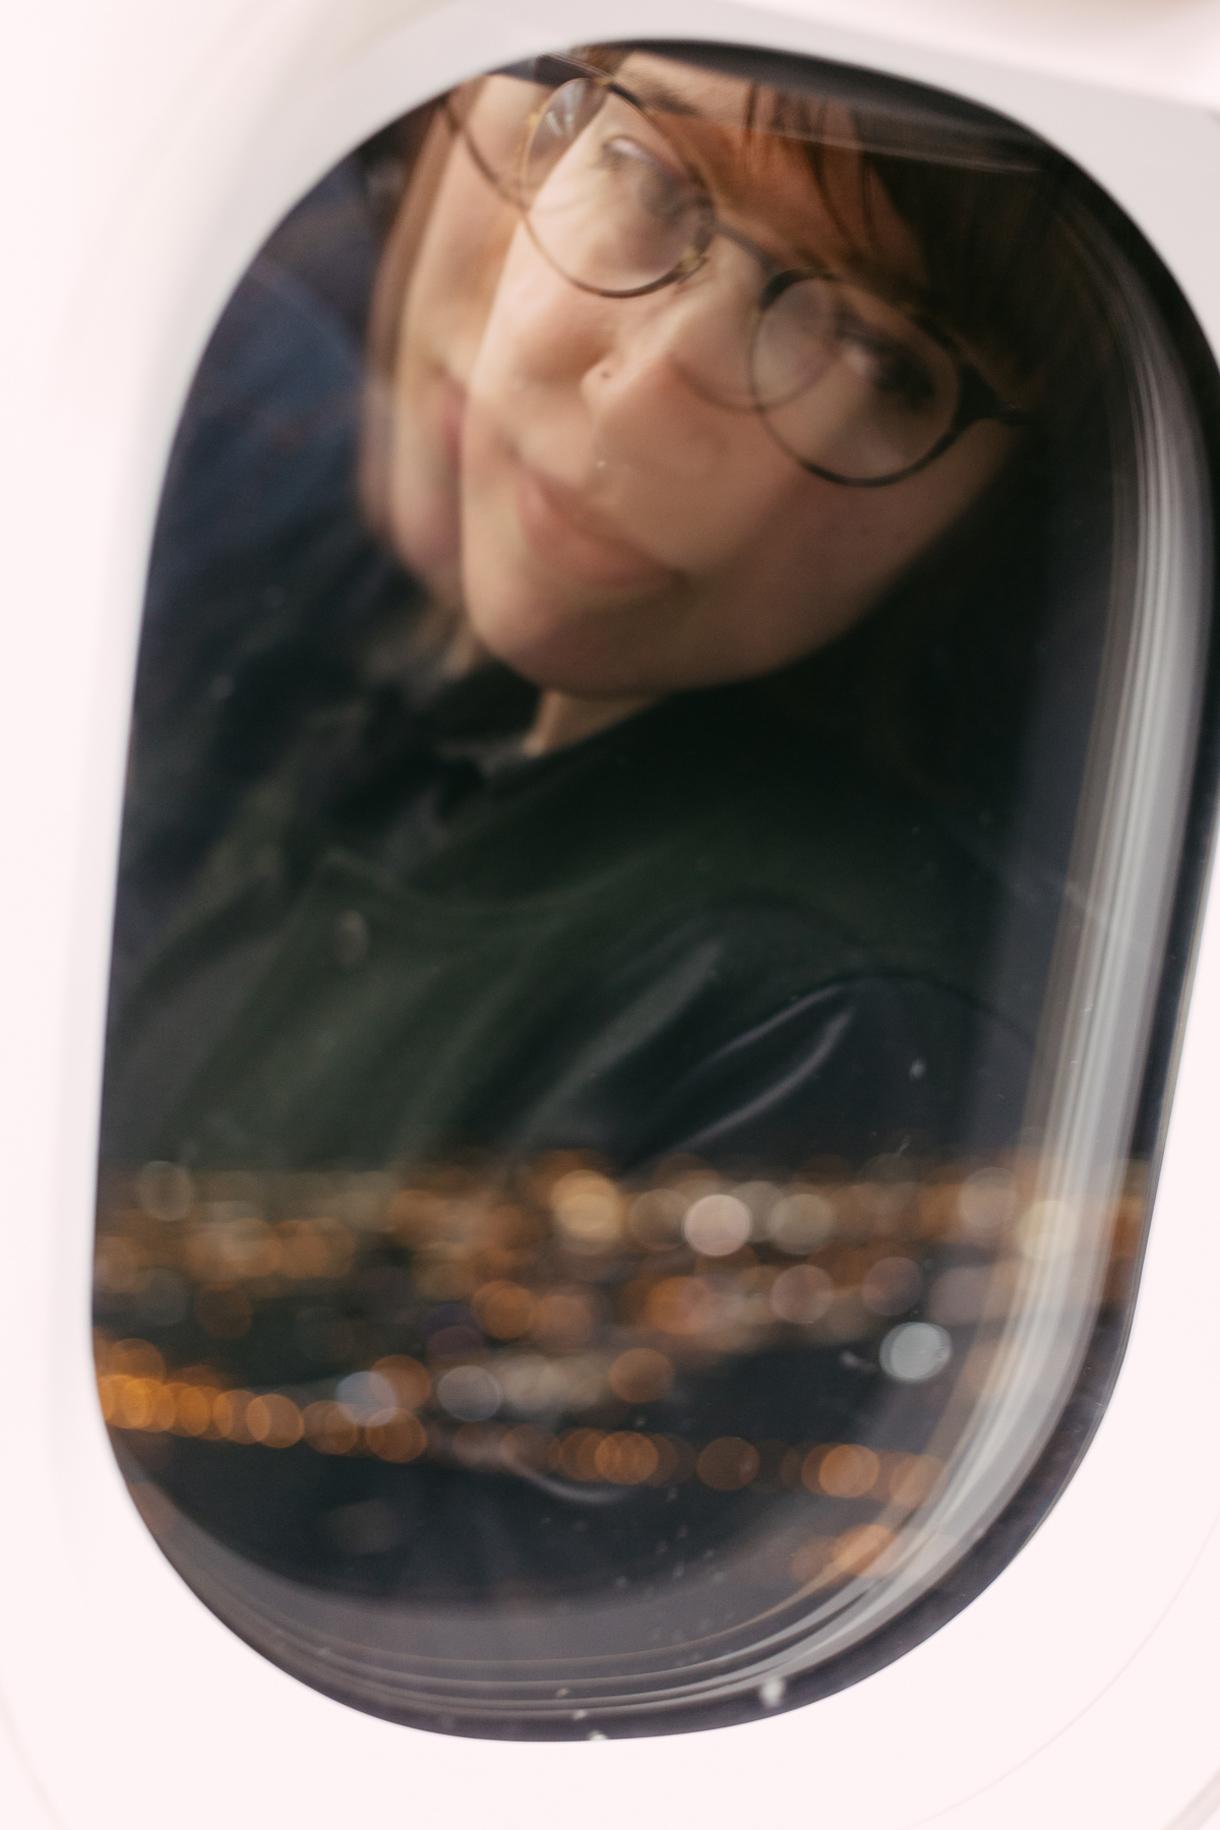 040-minneapolis-flight-plane-window.jpg